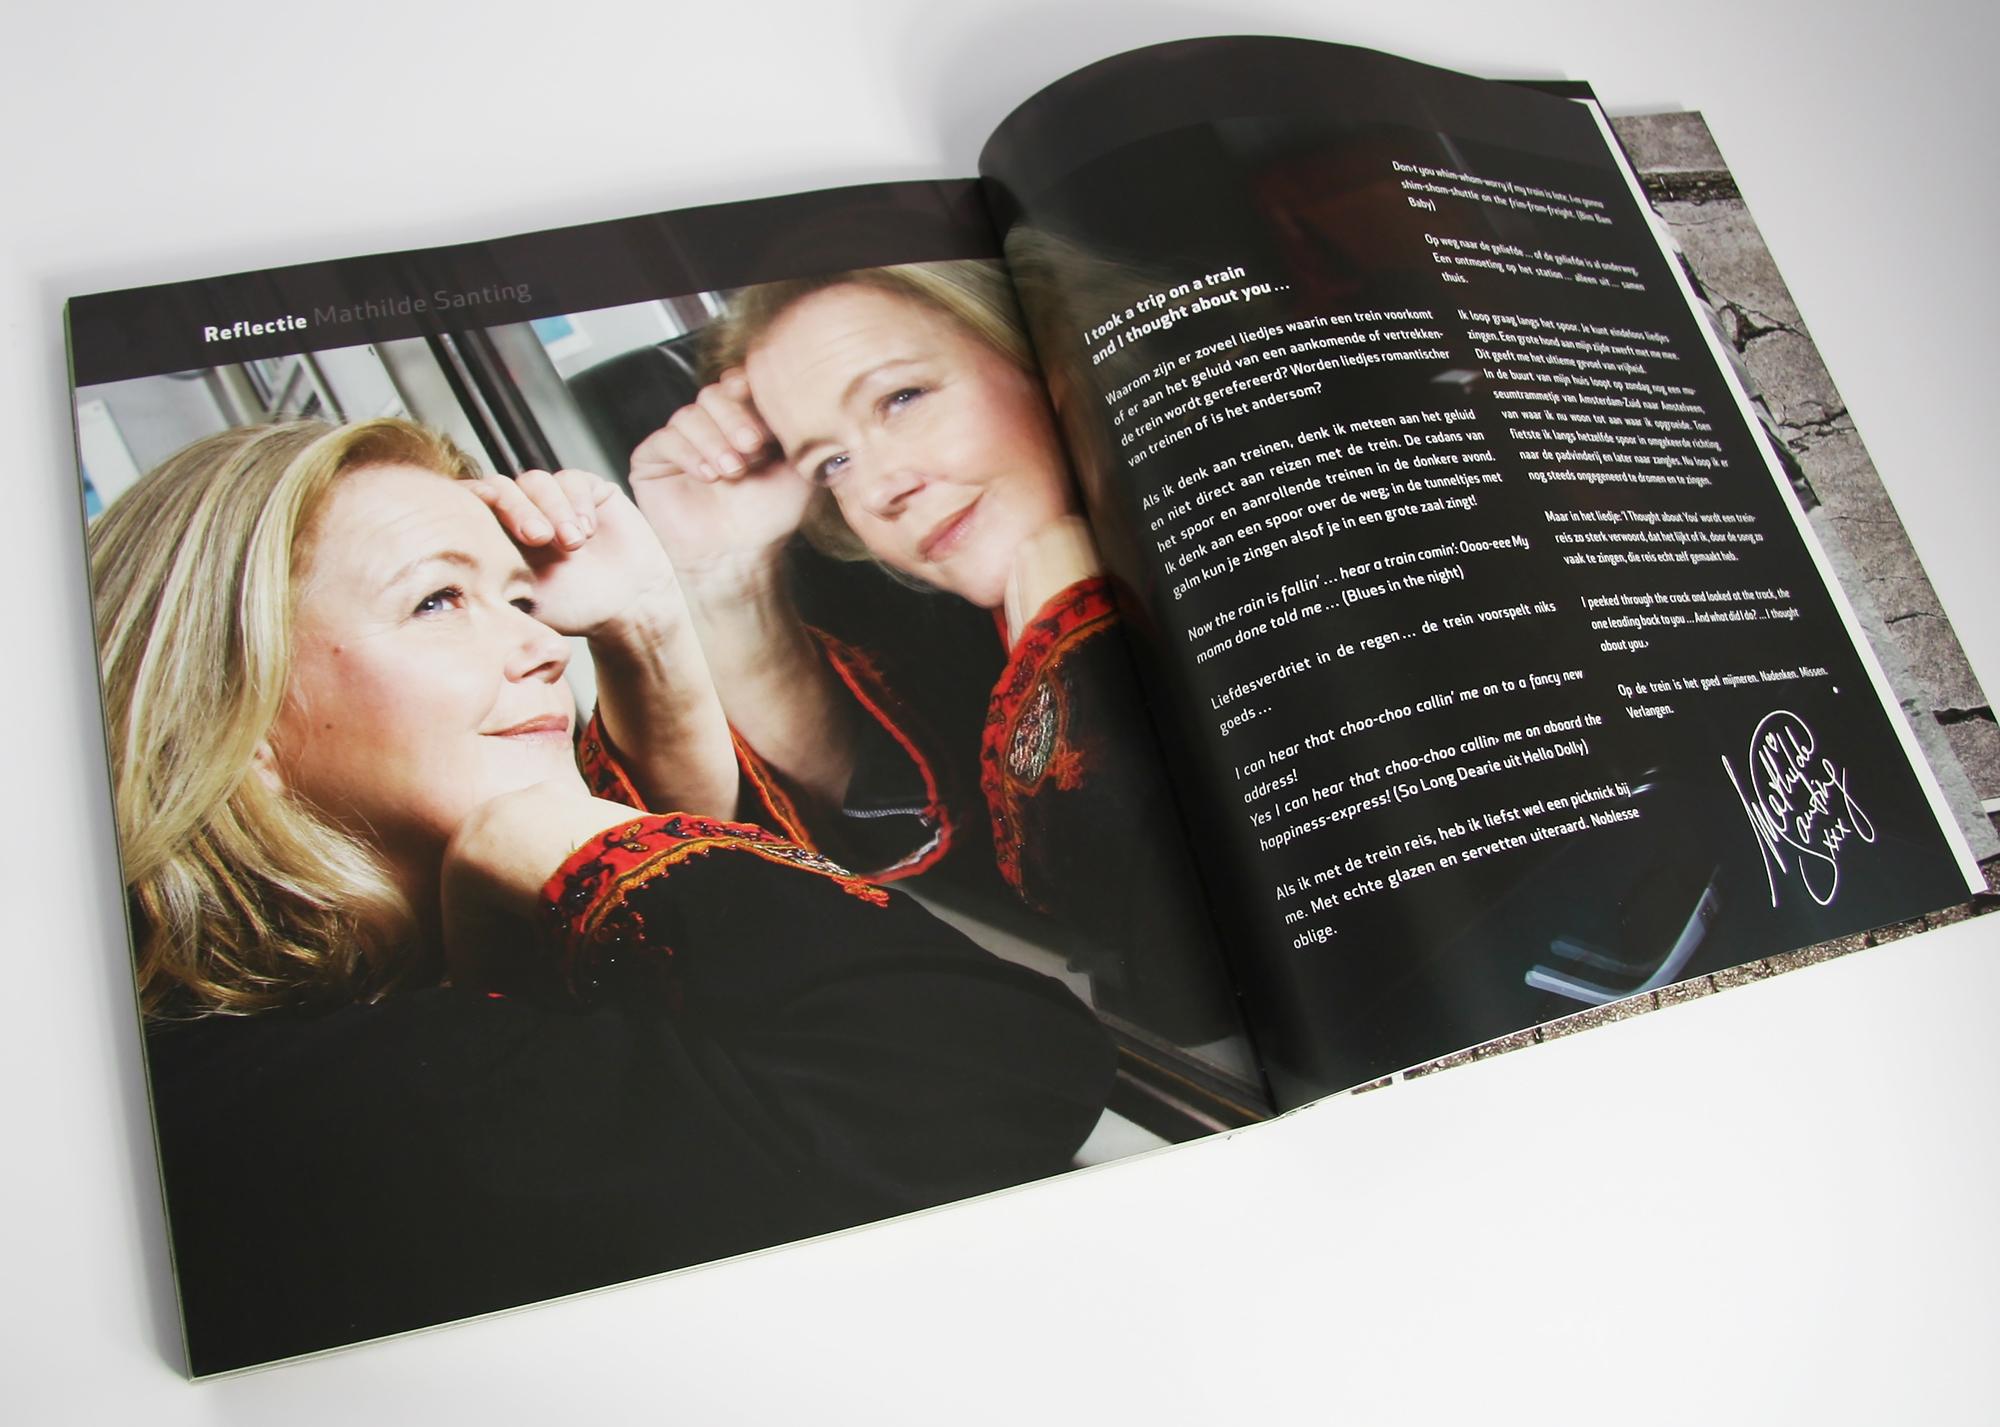 ProRail Interview Mathilde Santing